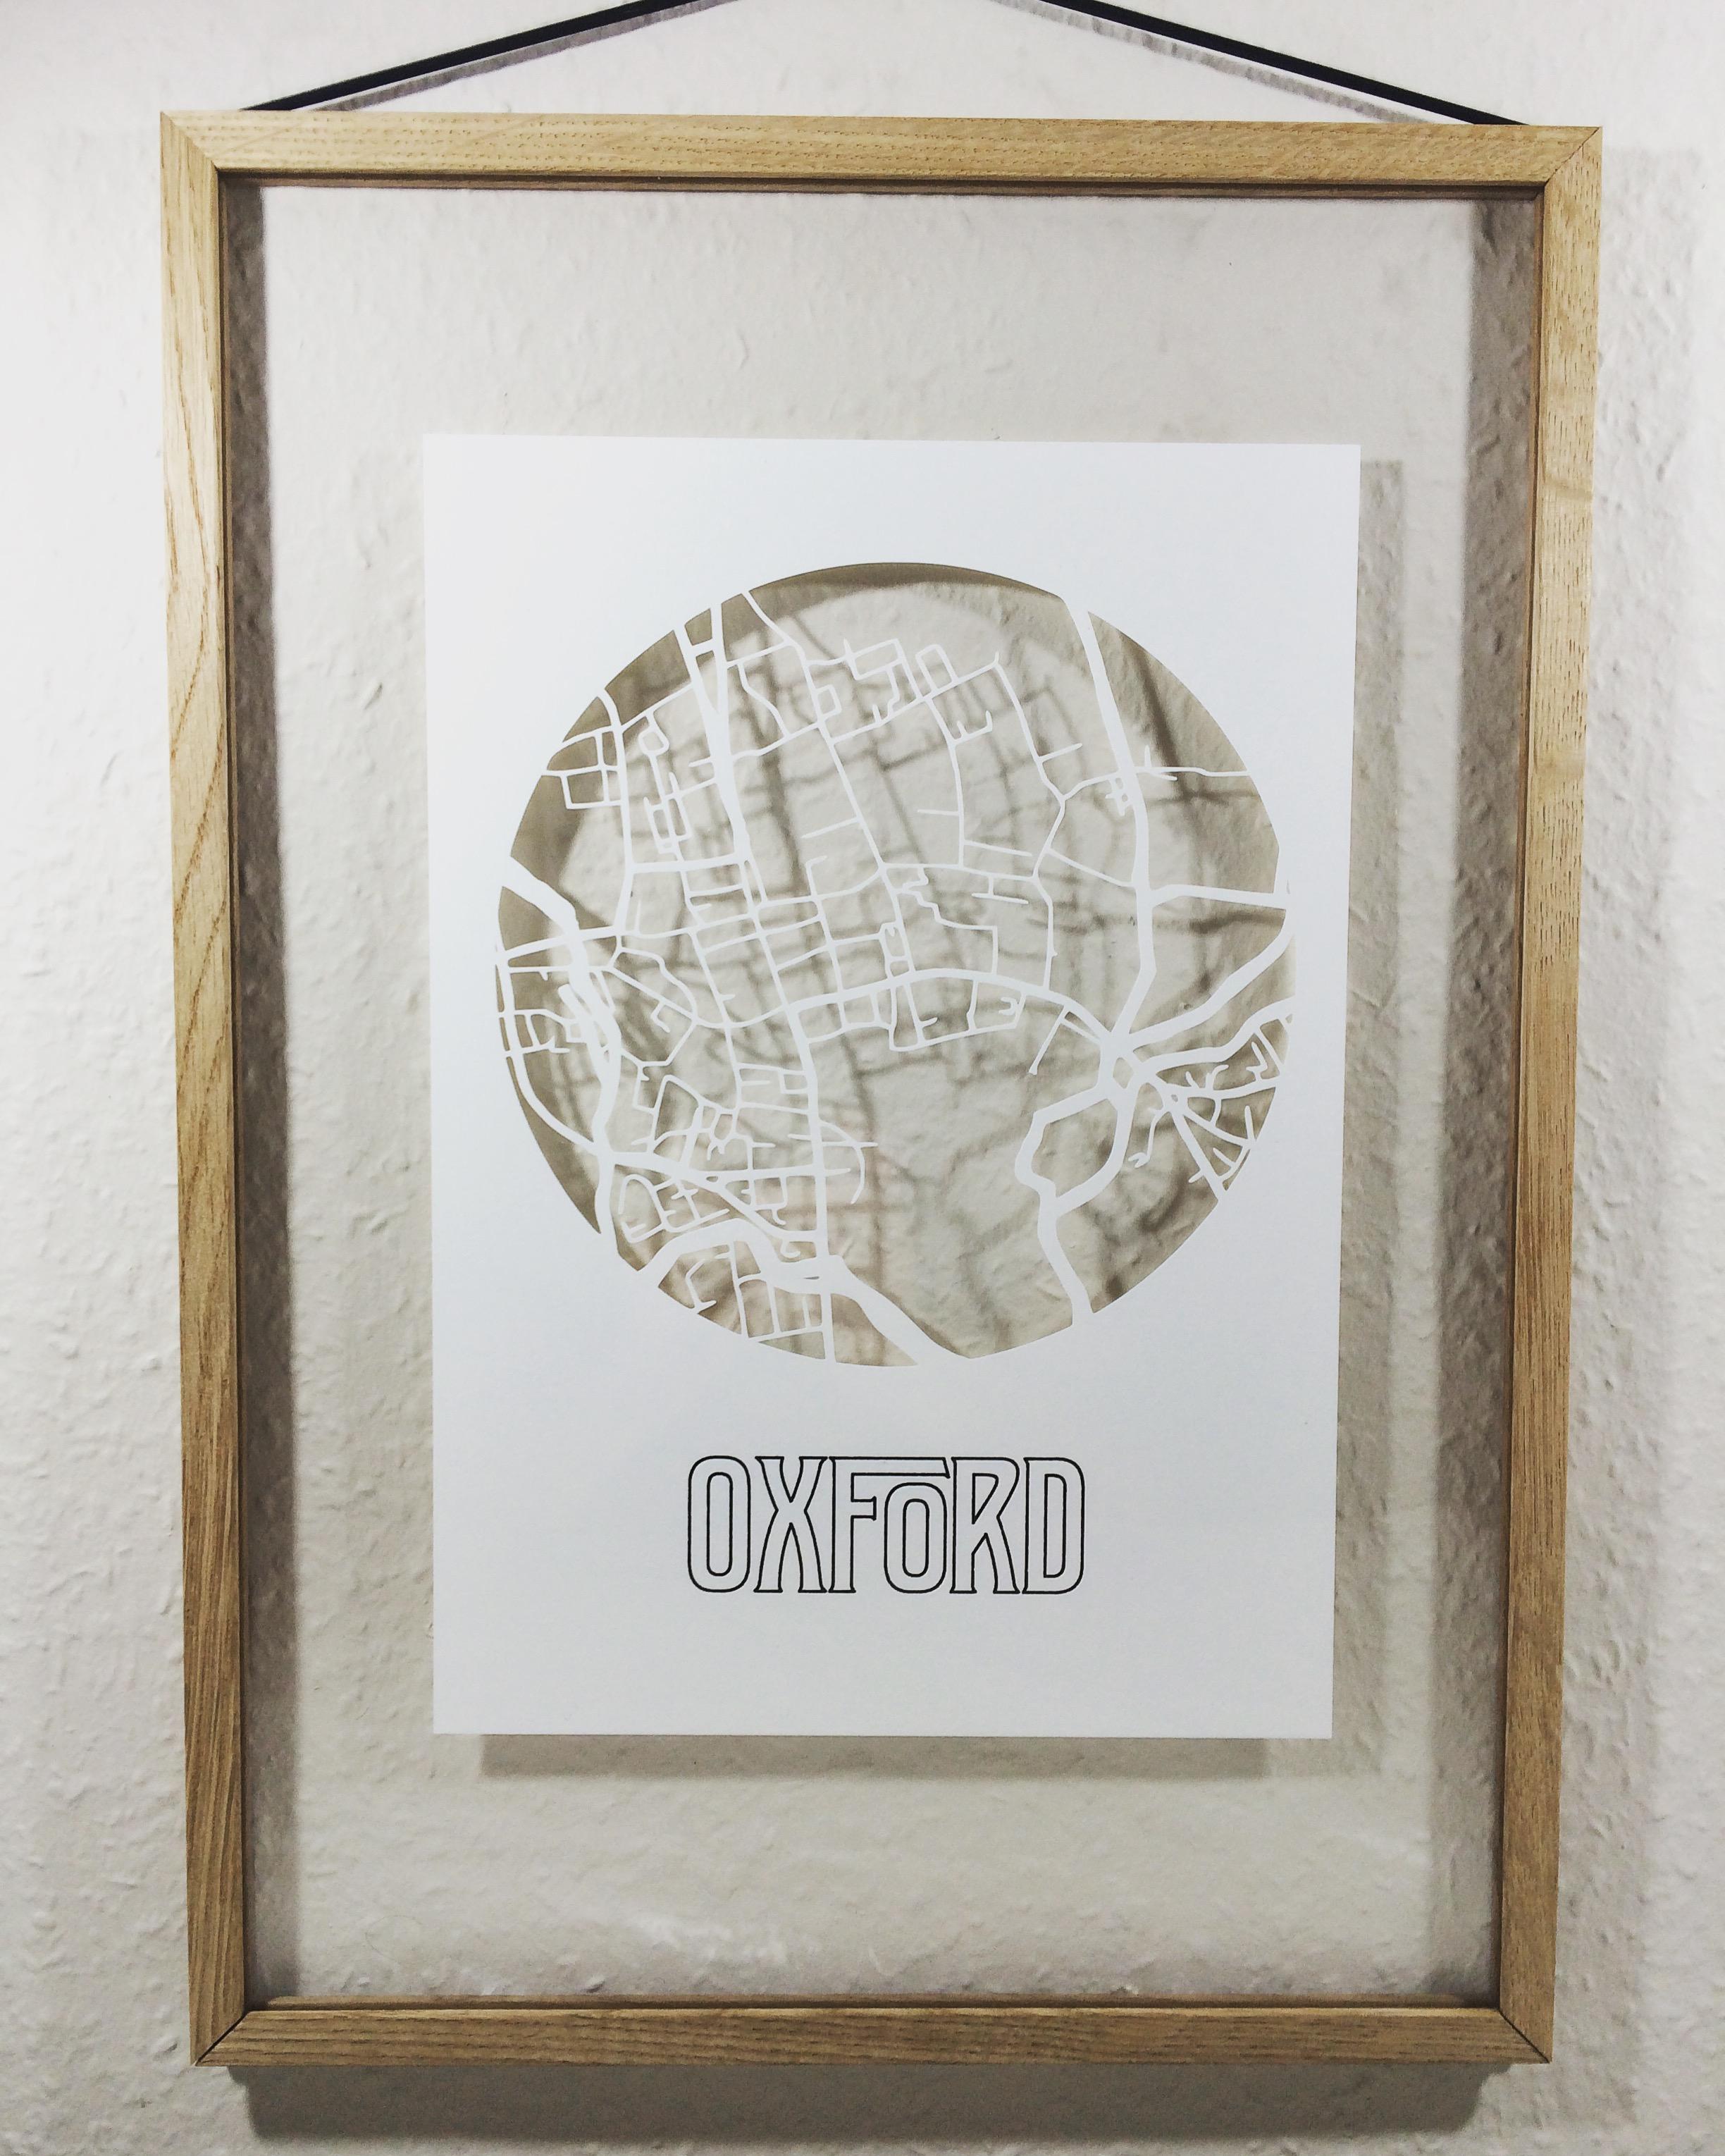 Kartegraphik Paper Cut Oxford Framing.JPG